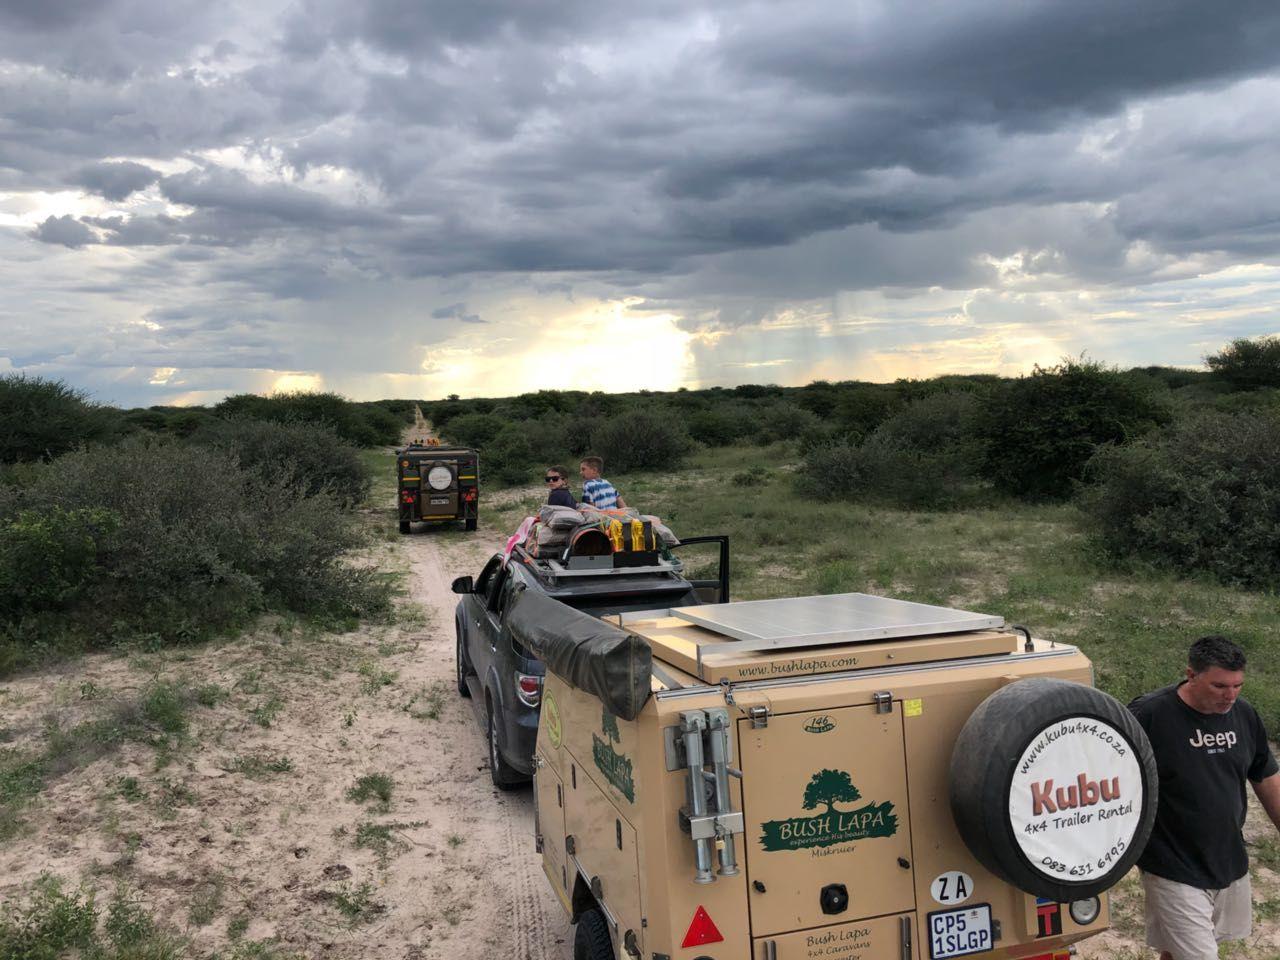 Kubu4x4 4x4 Trailer Rental 4x4 Trailer Hire 4x4 Caravan Rental 4x4 Caravan Hire Echo 3 Echo 4 Caravan Hire Camping Trailer Rental Weekend Camping Trip